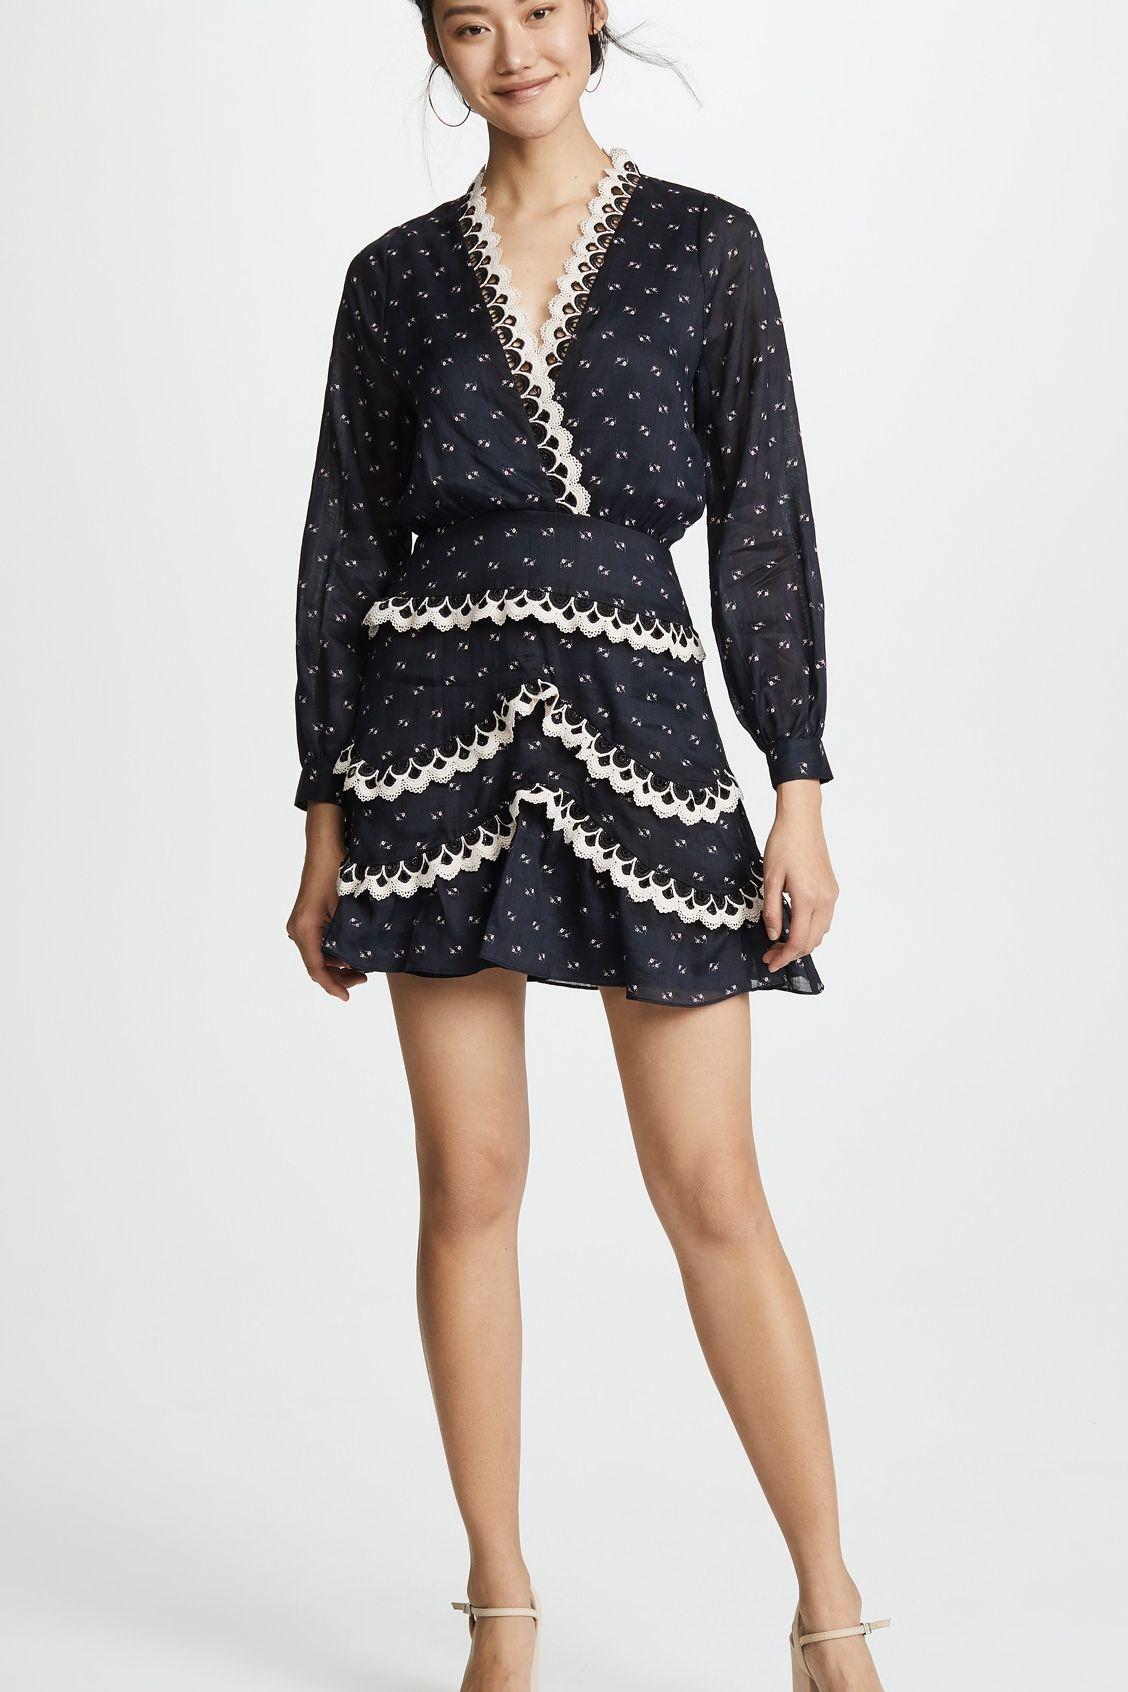 Stevie May Coronado Mini Dress 3 Preview Images